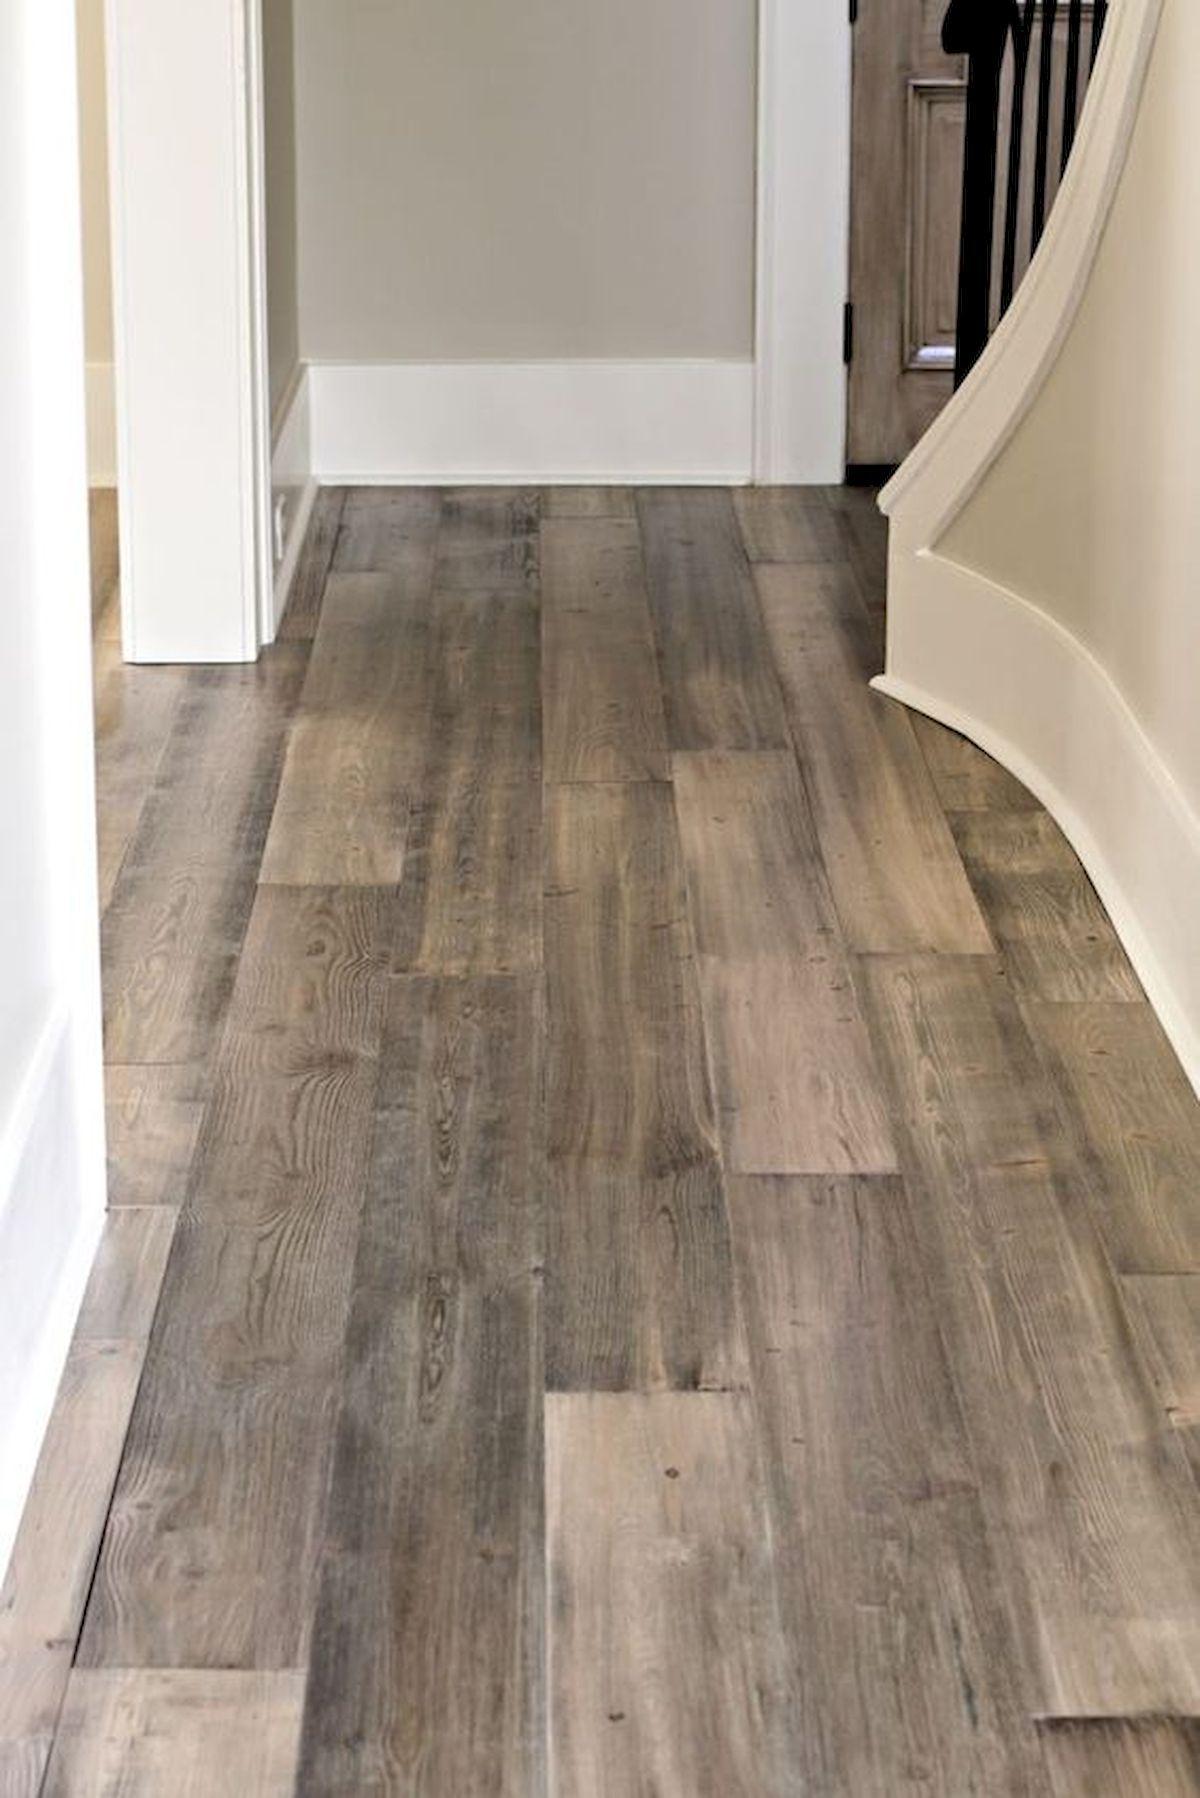 9 Gorgeous Hardwood Floor Ideas for Interior Home   Rustic ...